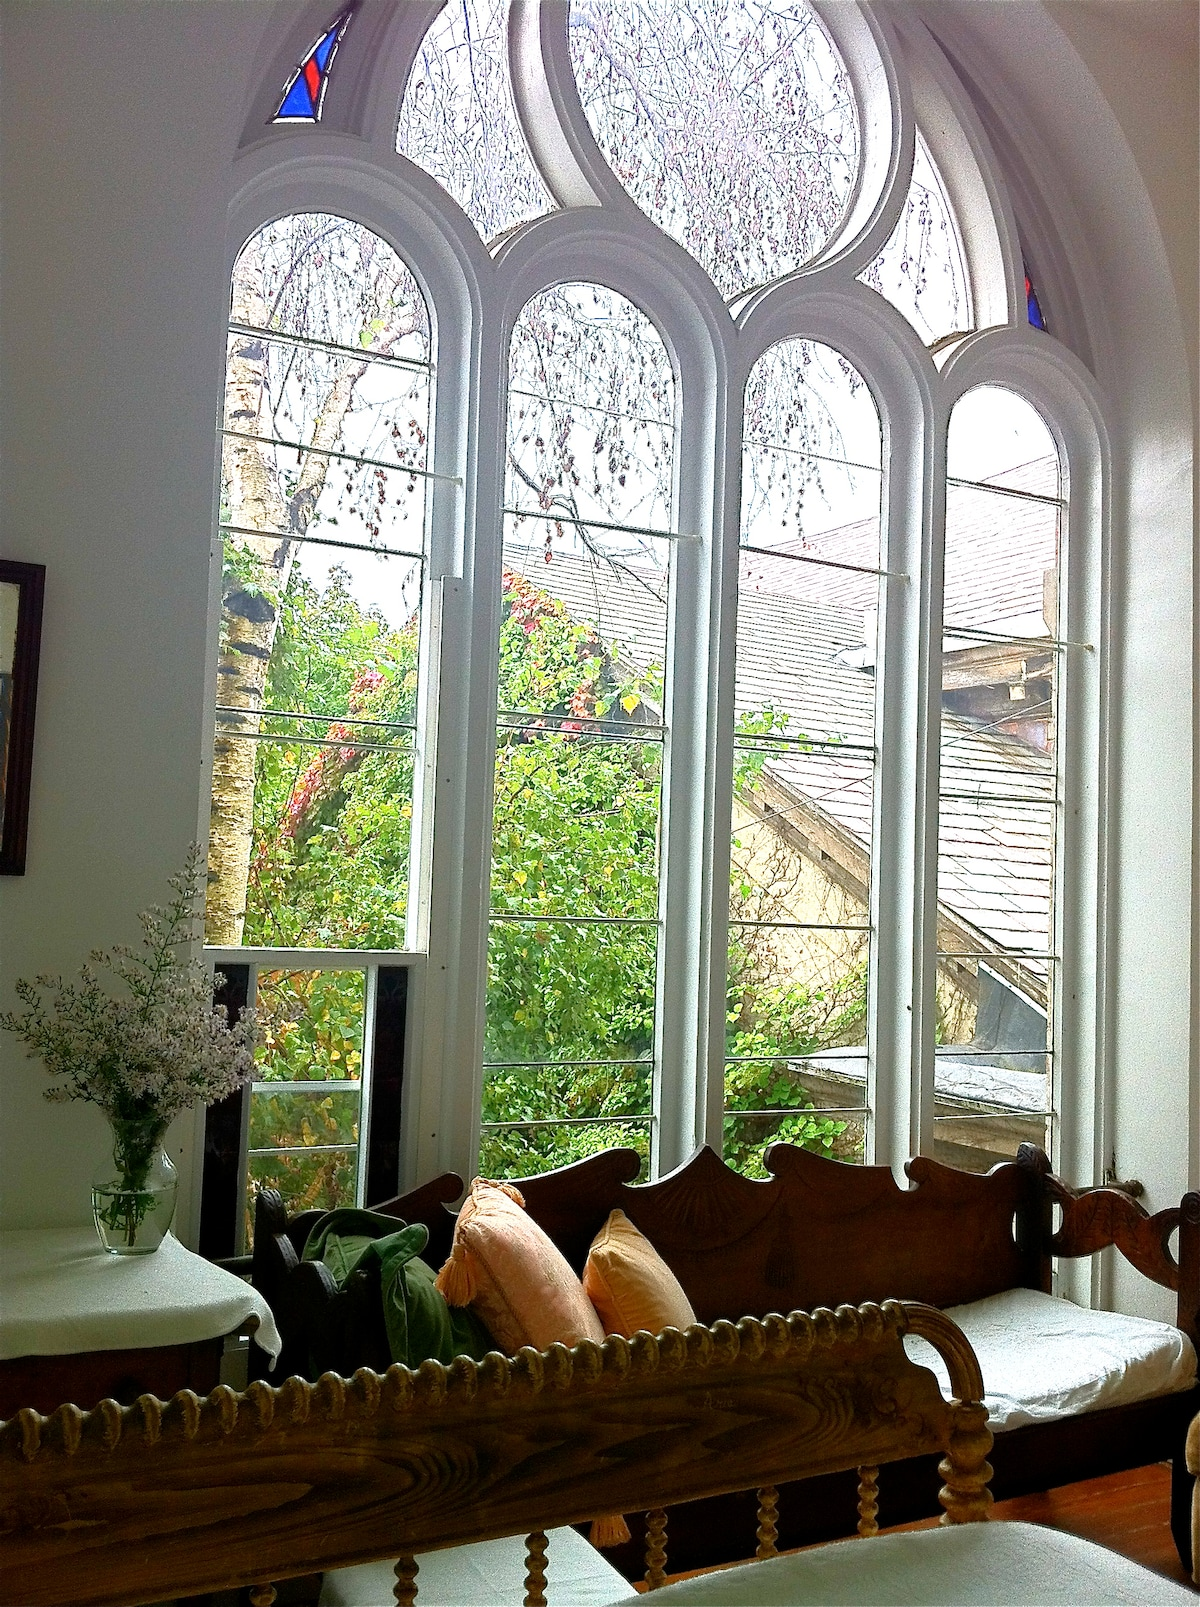 The chapel room window.